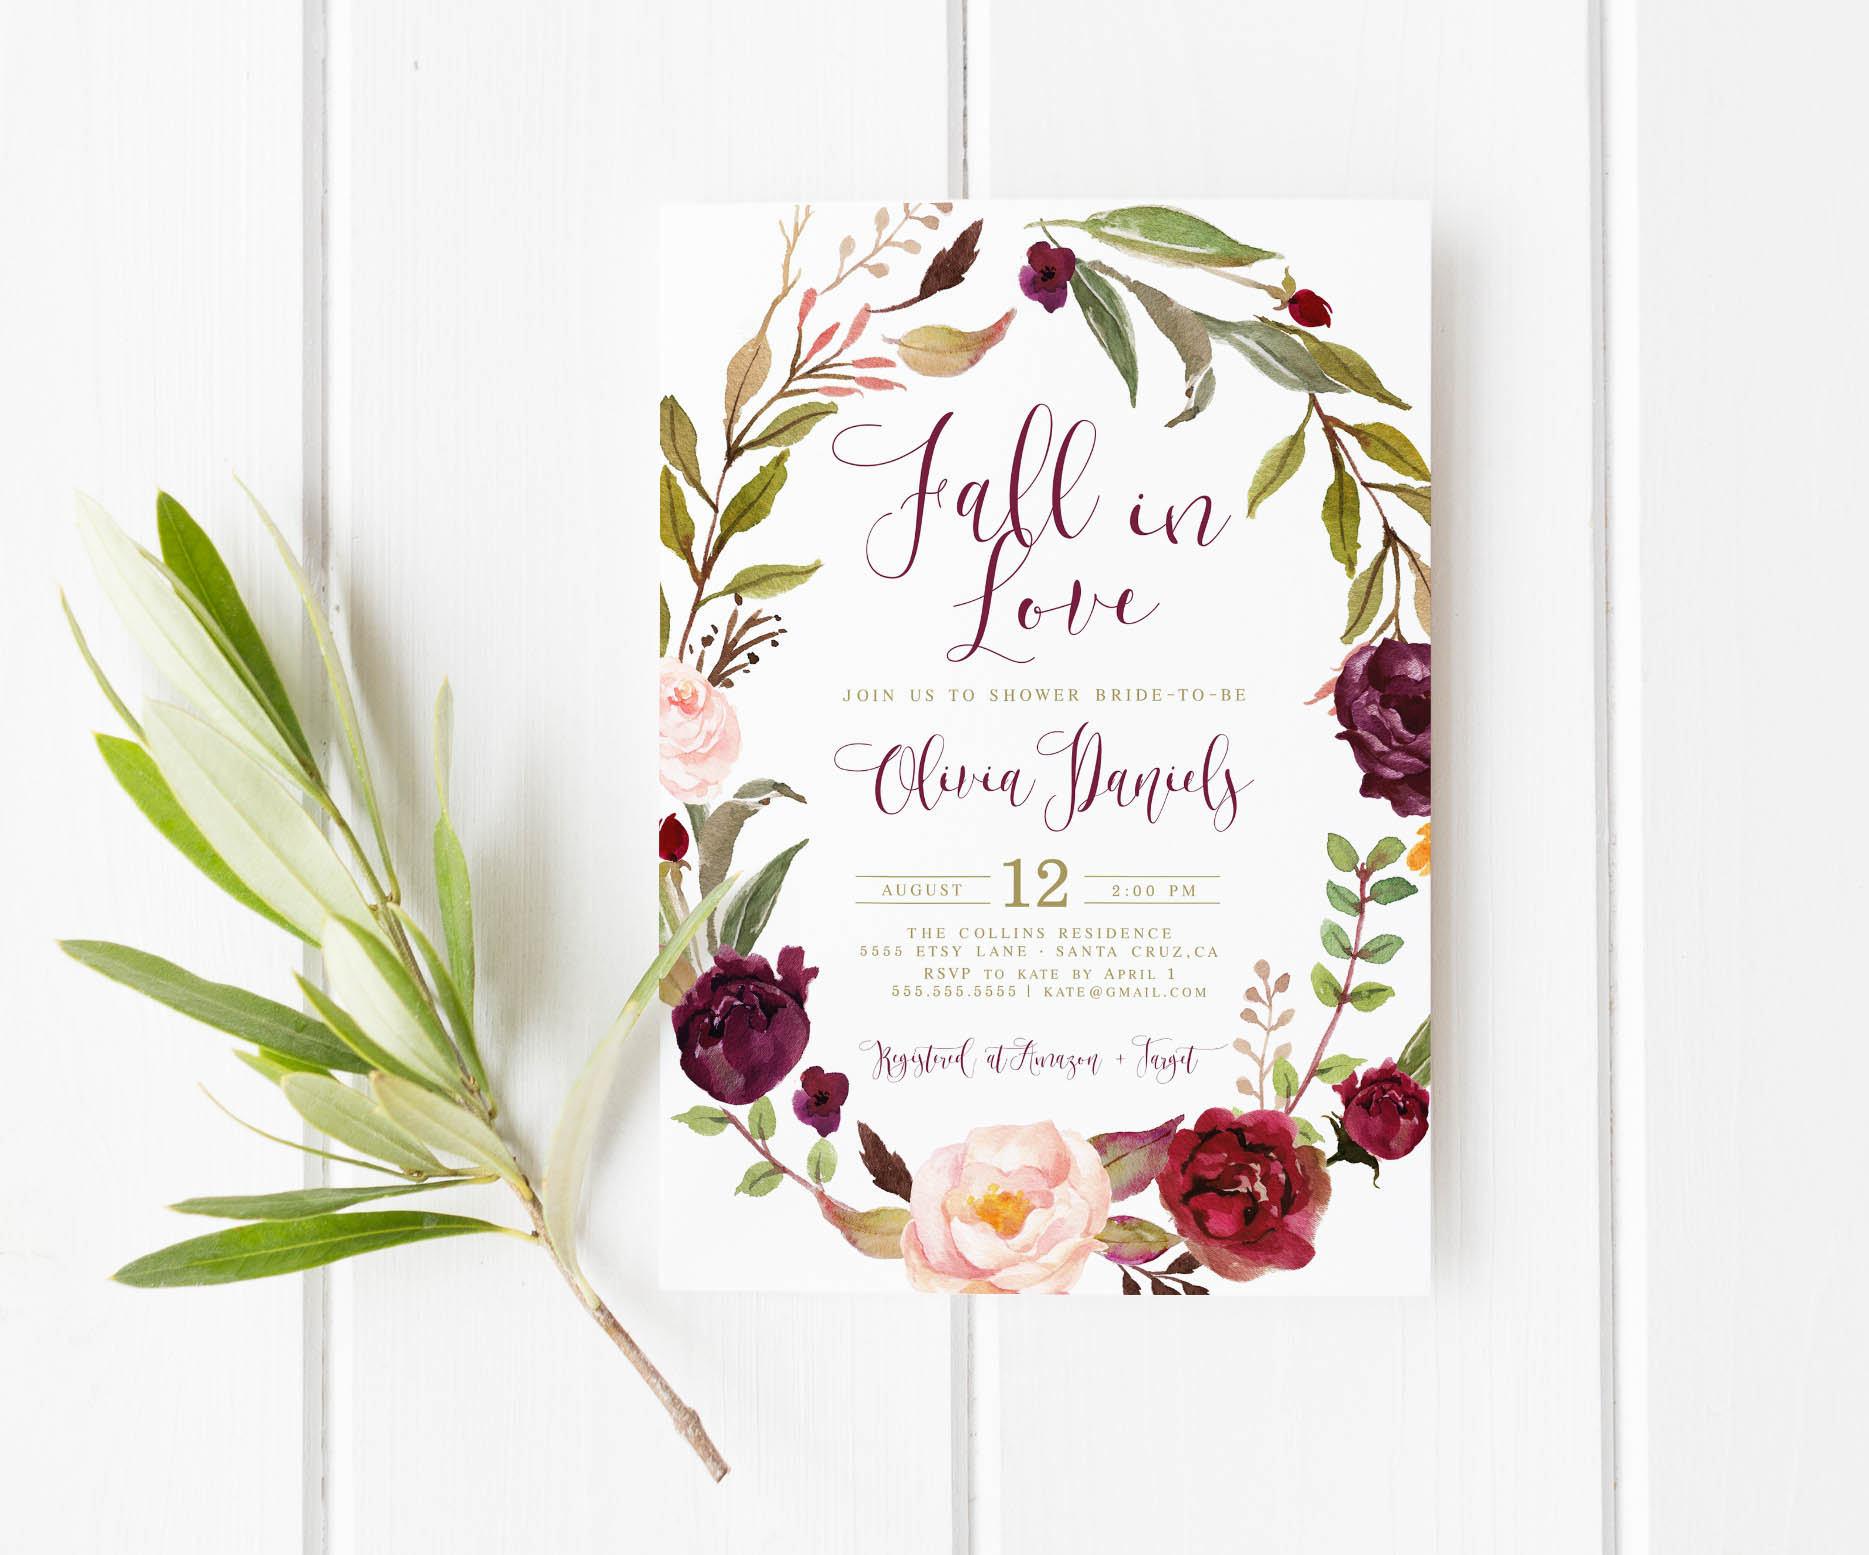 Fall Wedding Shower Invitations: Autumn Bridal Shower Invitation Fall Boho Bridal Shower